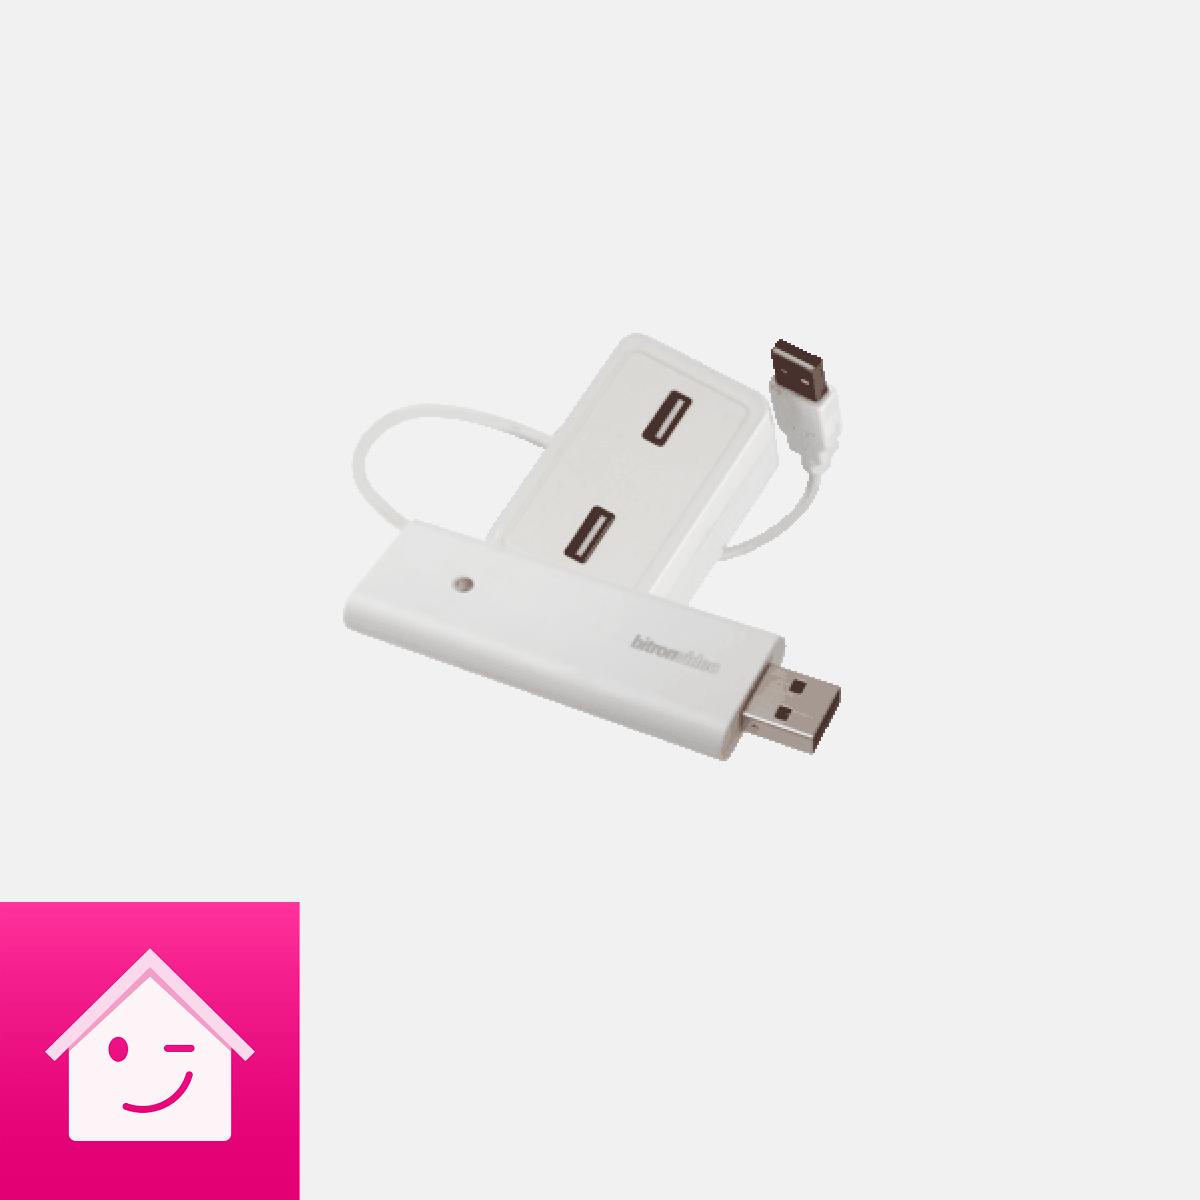 Telekom Smart Home ZigBee Funkstick V2 inkl USB-Hub